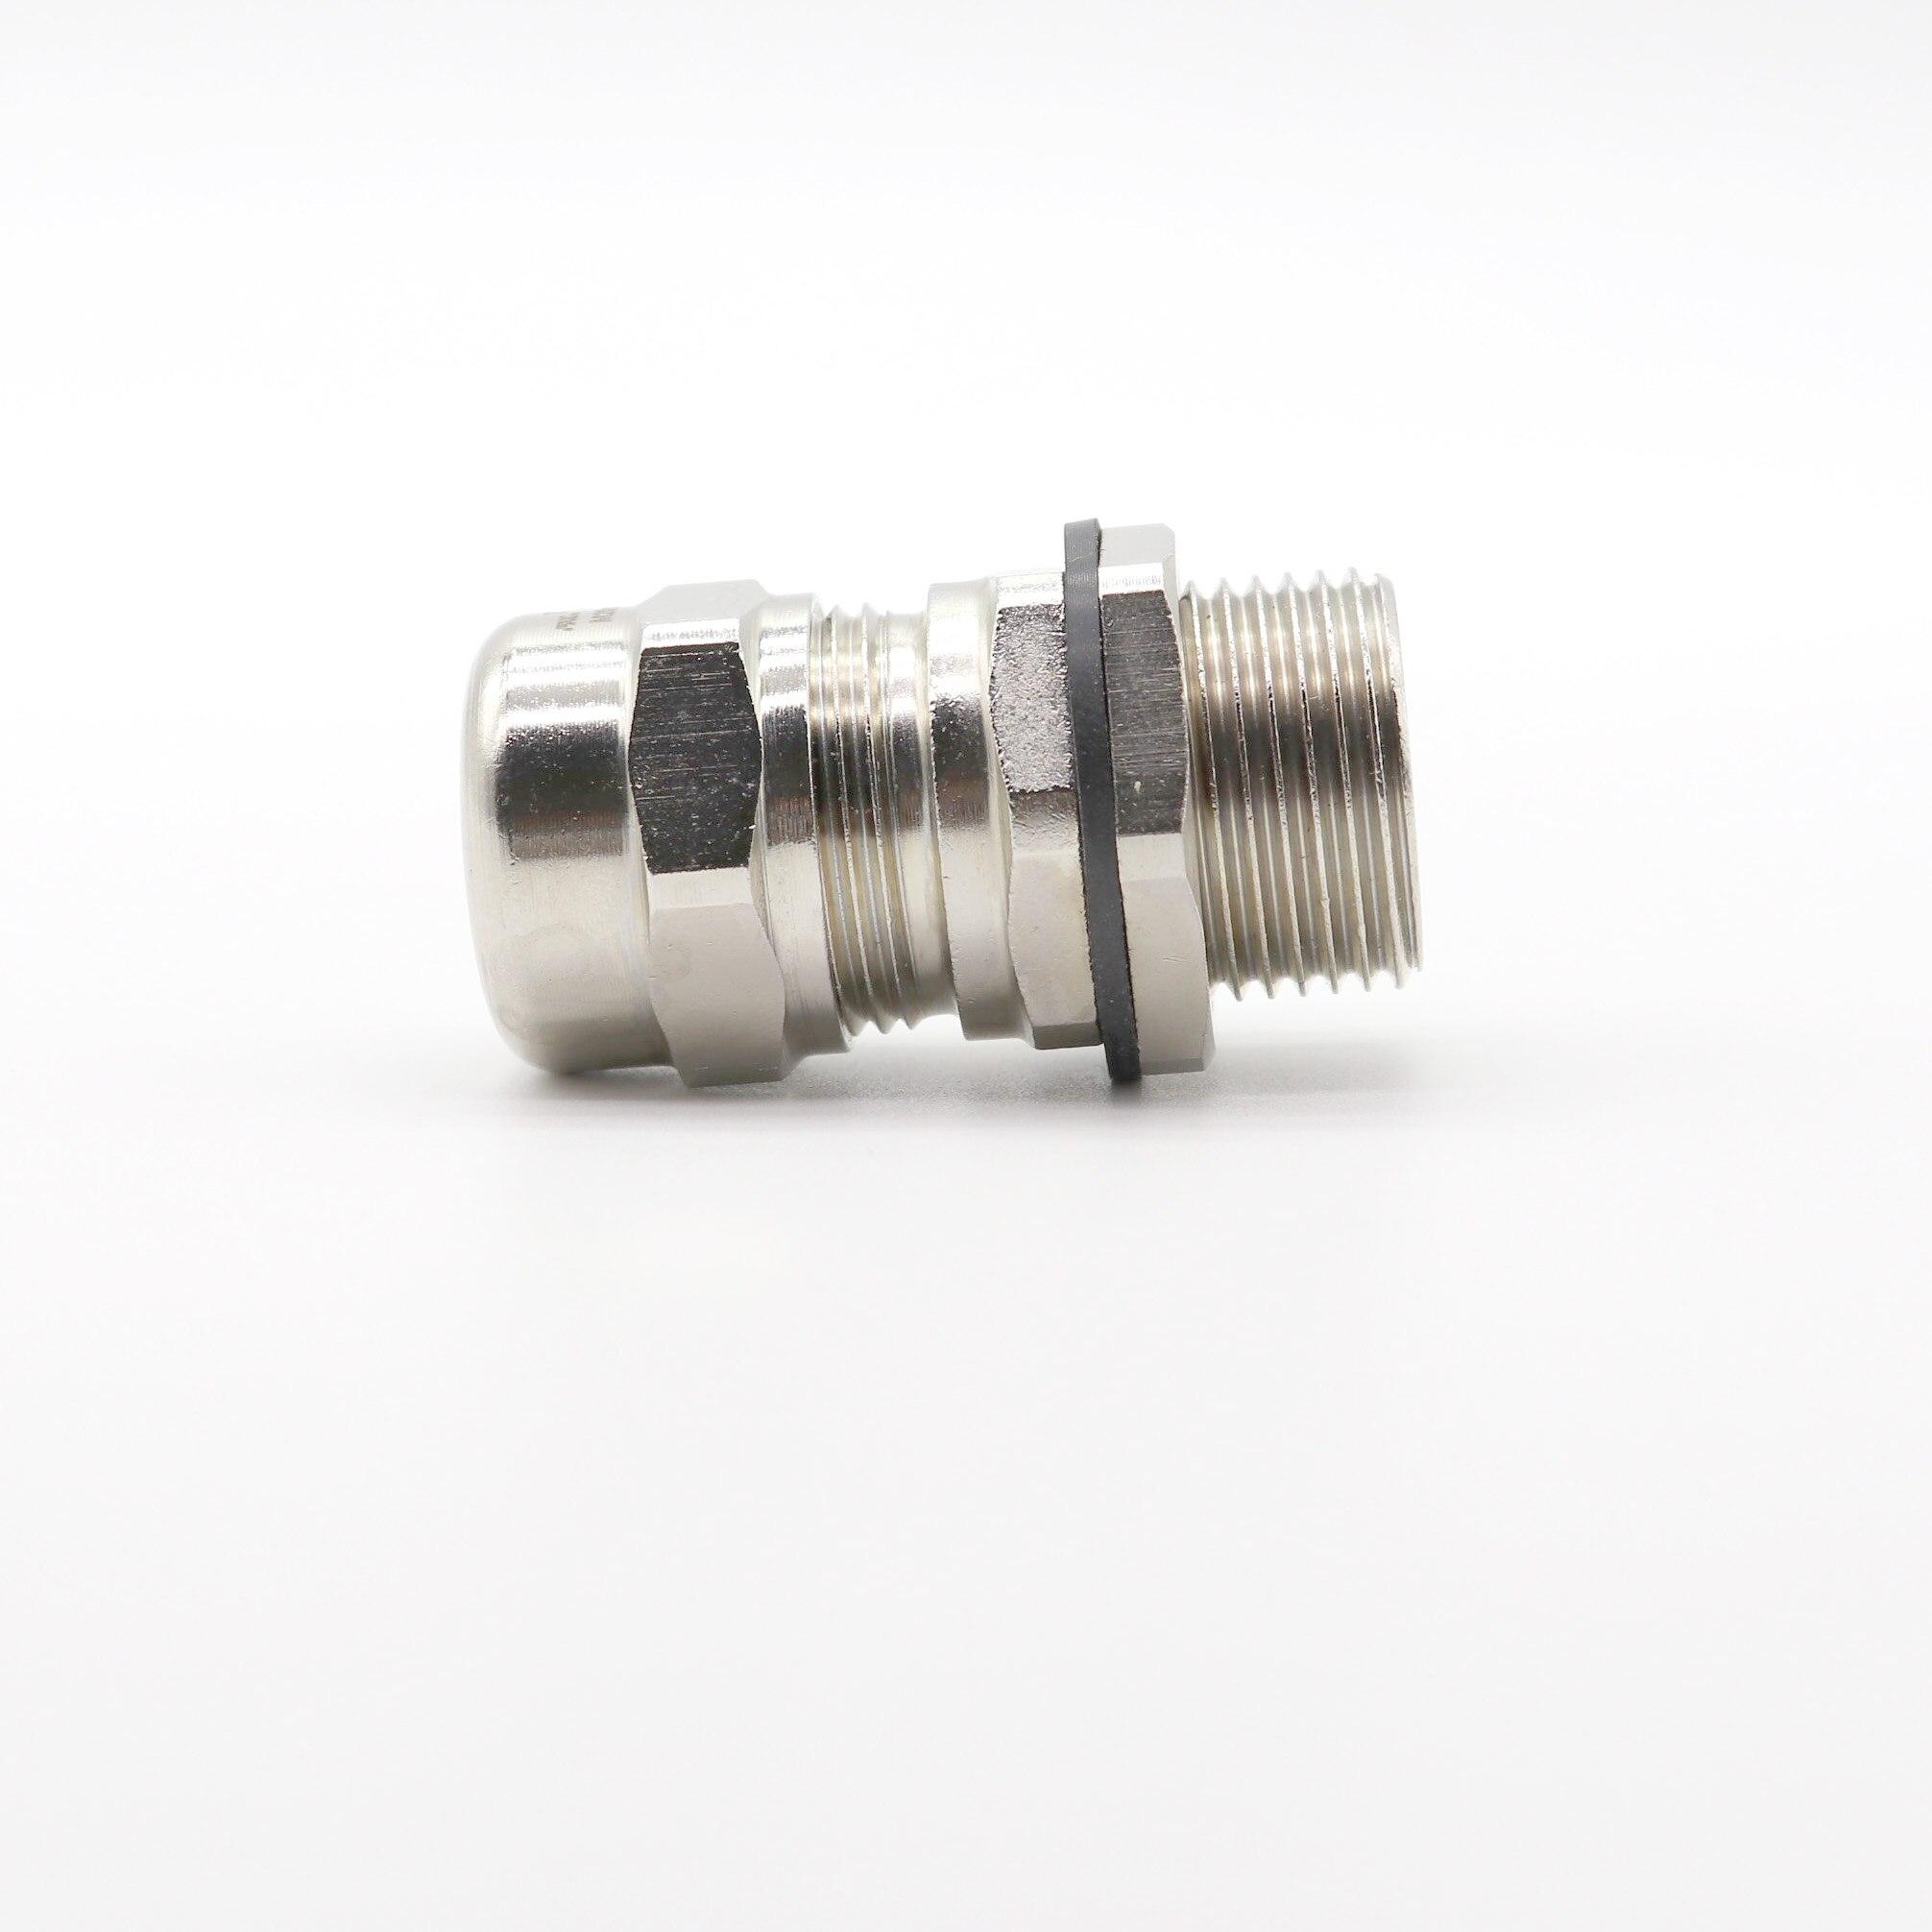 BMBCVG-0S Äquivalent multi größe kabel drüsen m12 * 1,5 belüftung arrmoured kabelverschraubung größen